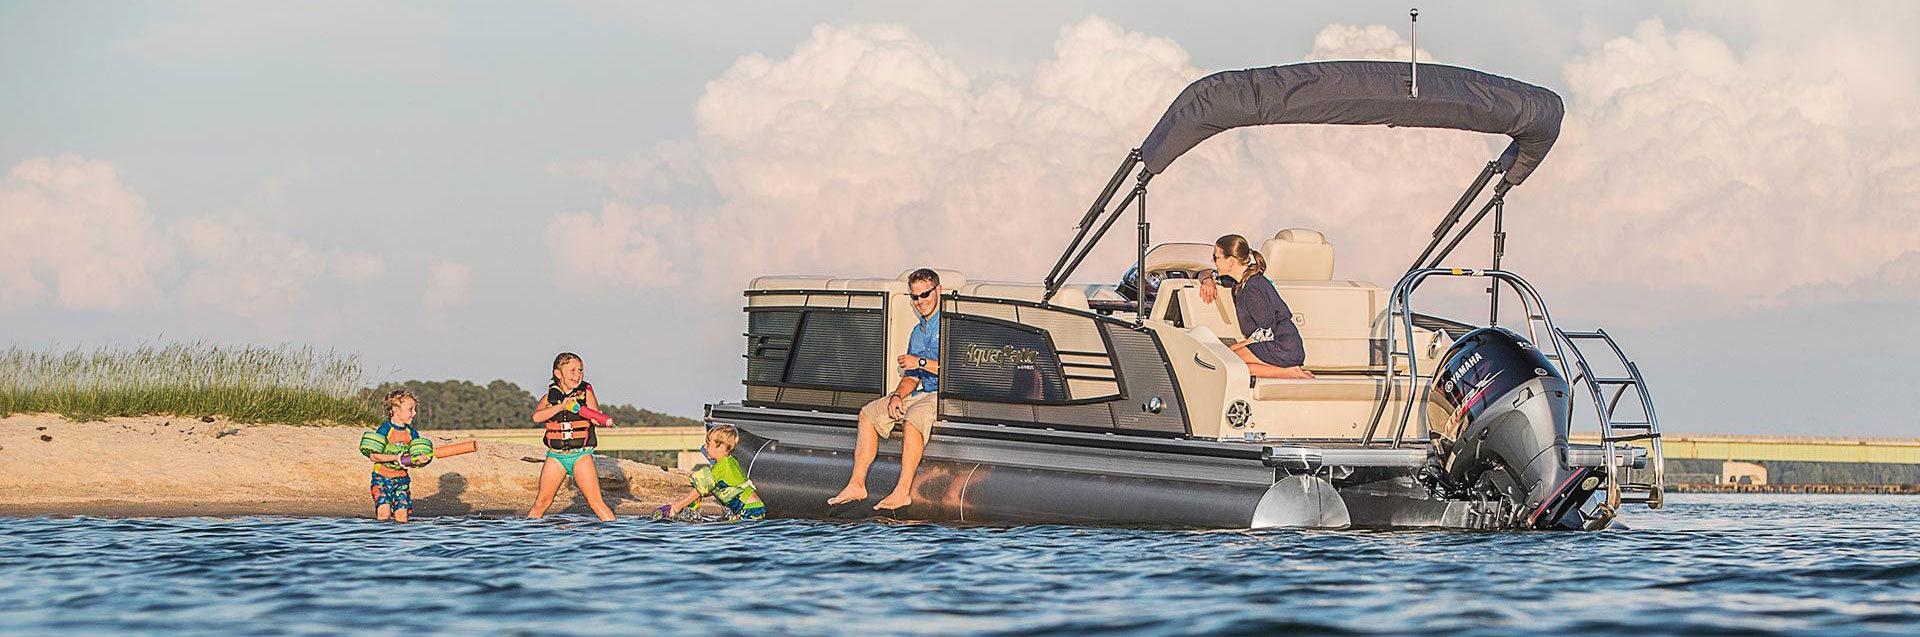 476_197_Aqua Patio 235 Elite Pontoon Boat 1